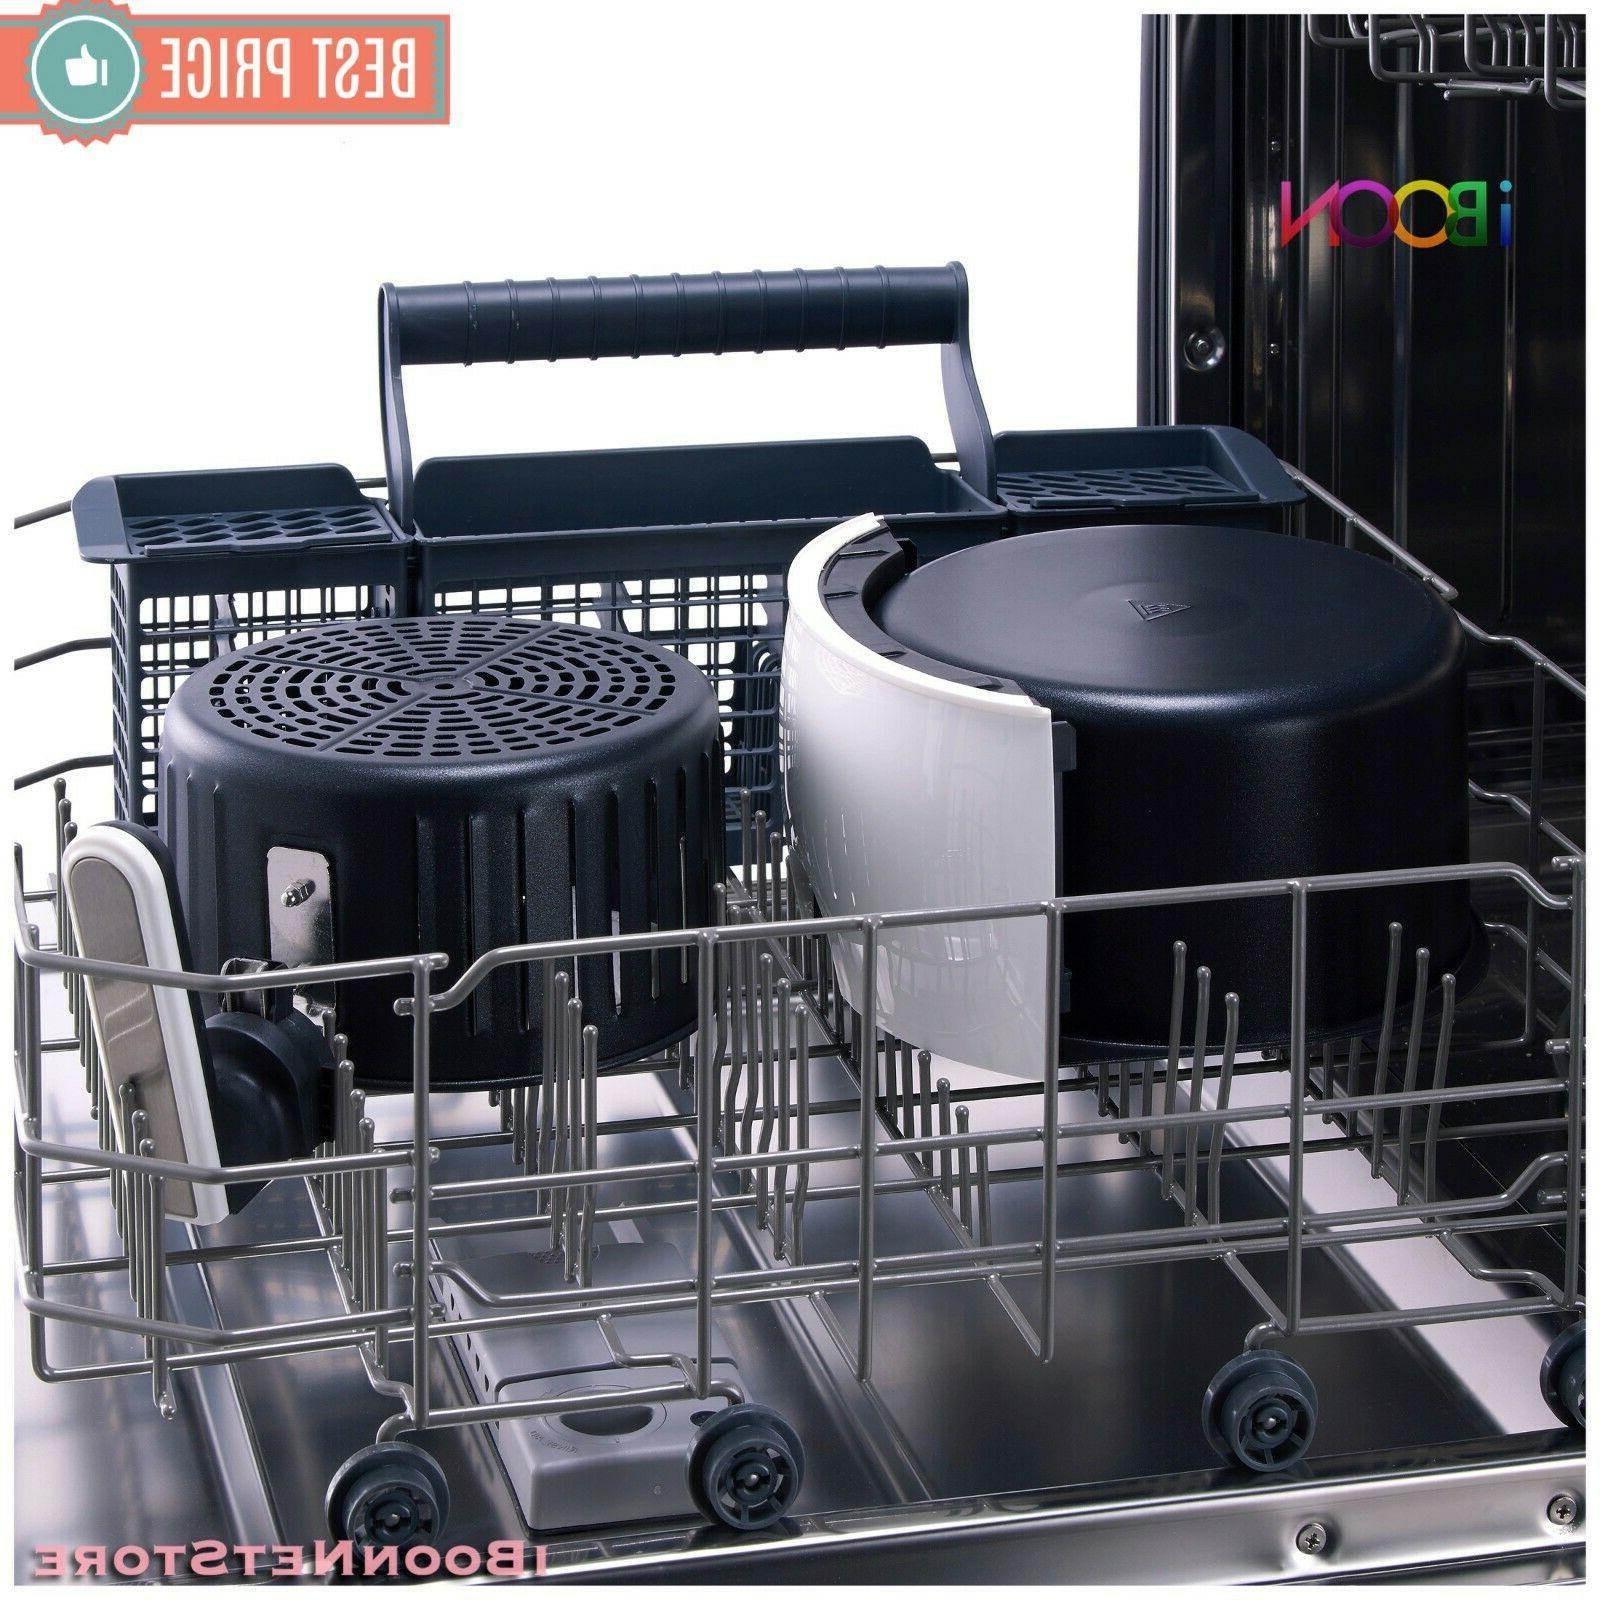 Farberware Digital Air Oven Rotisserie qt NONSTICK